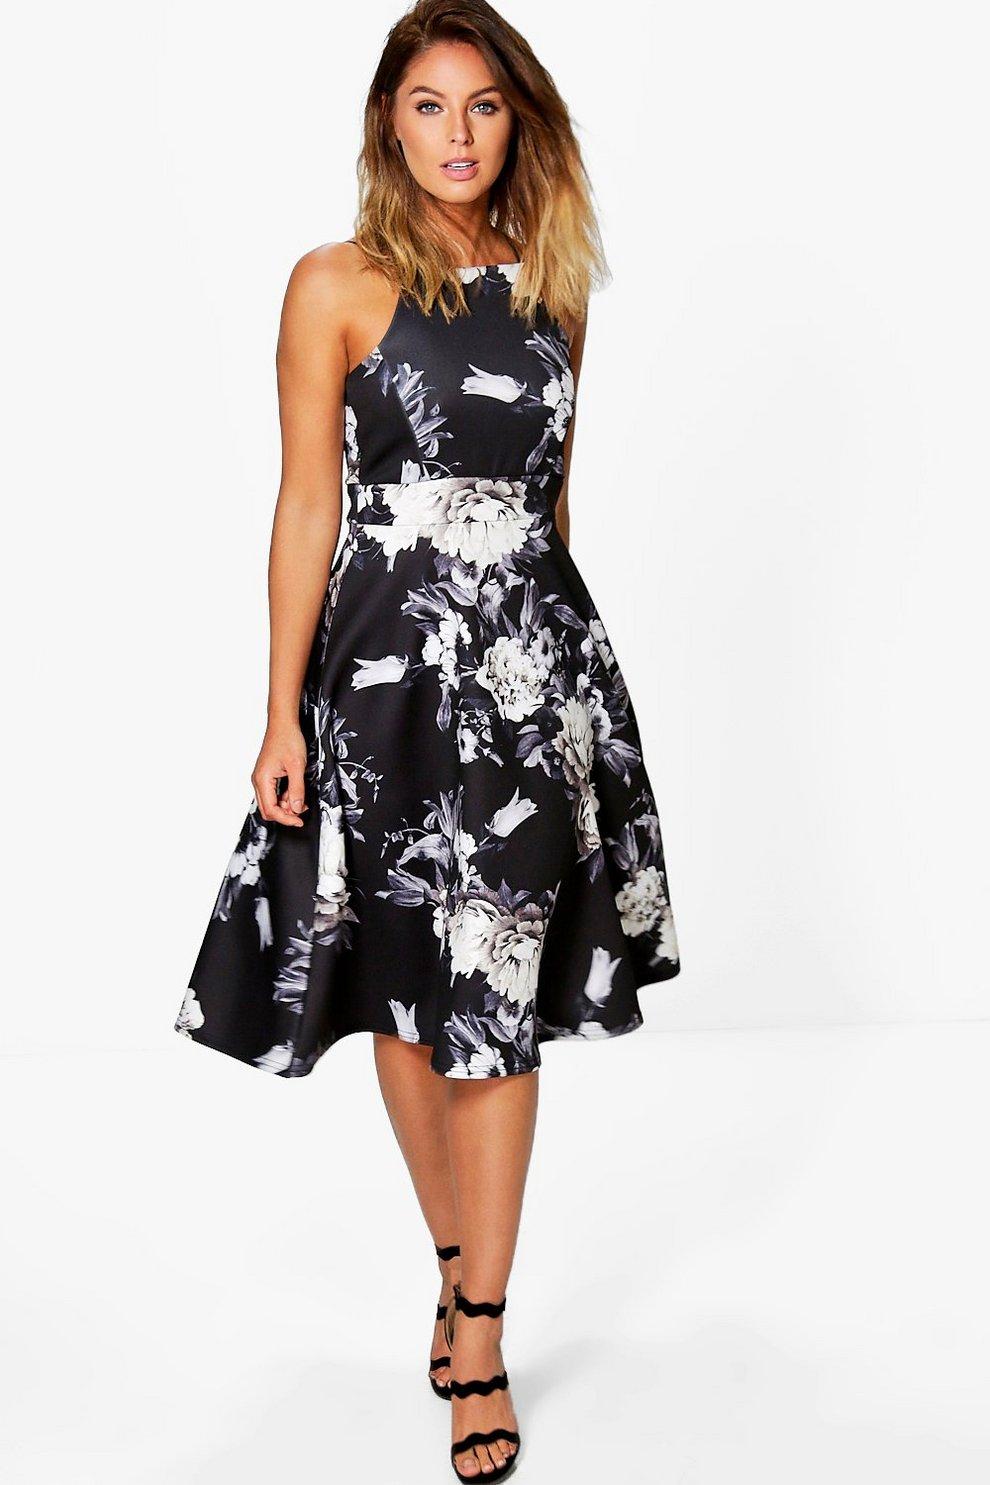 364cd971de8e Womens Black Floral Strappy Midi Skater Dress